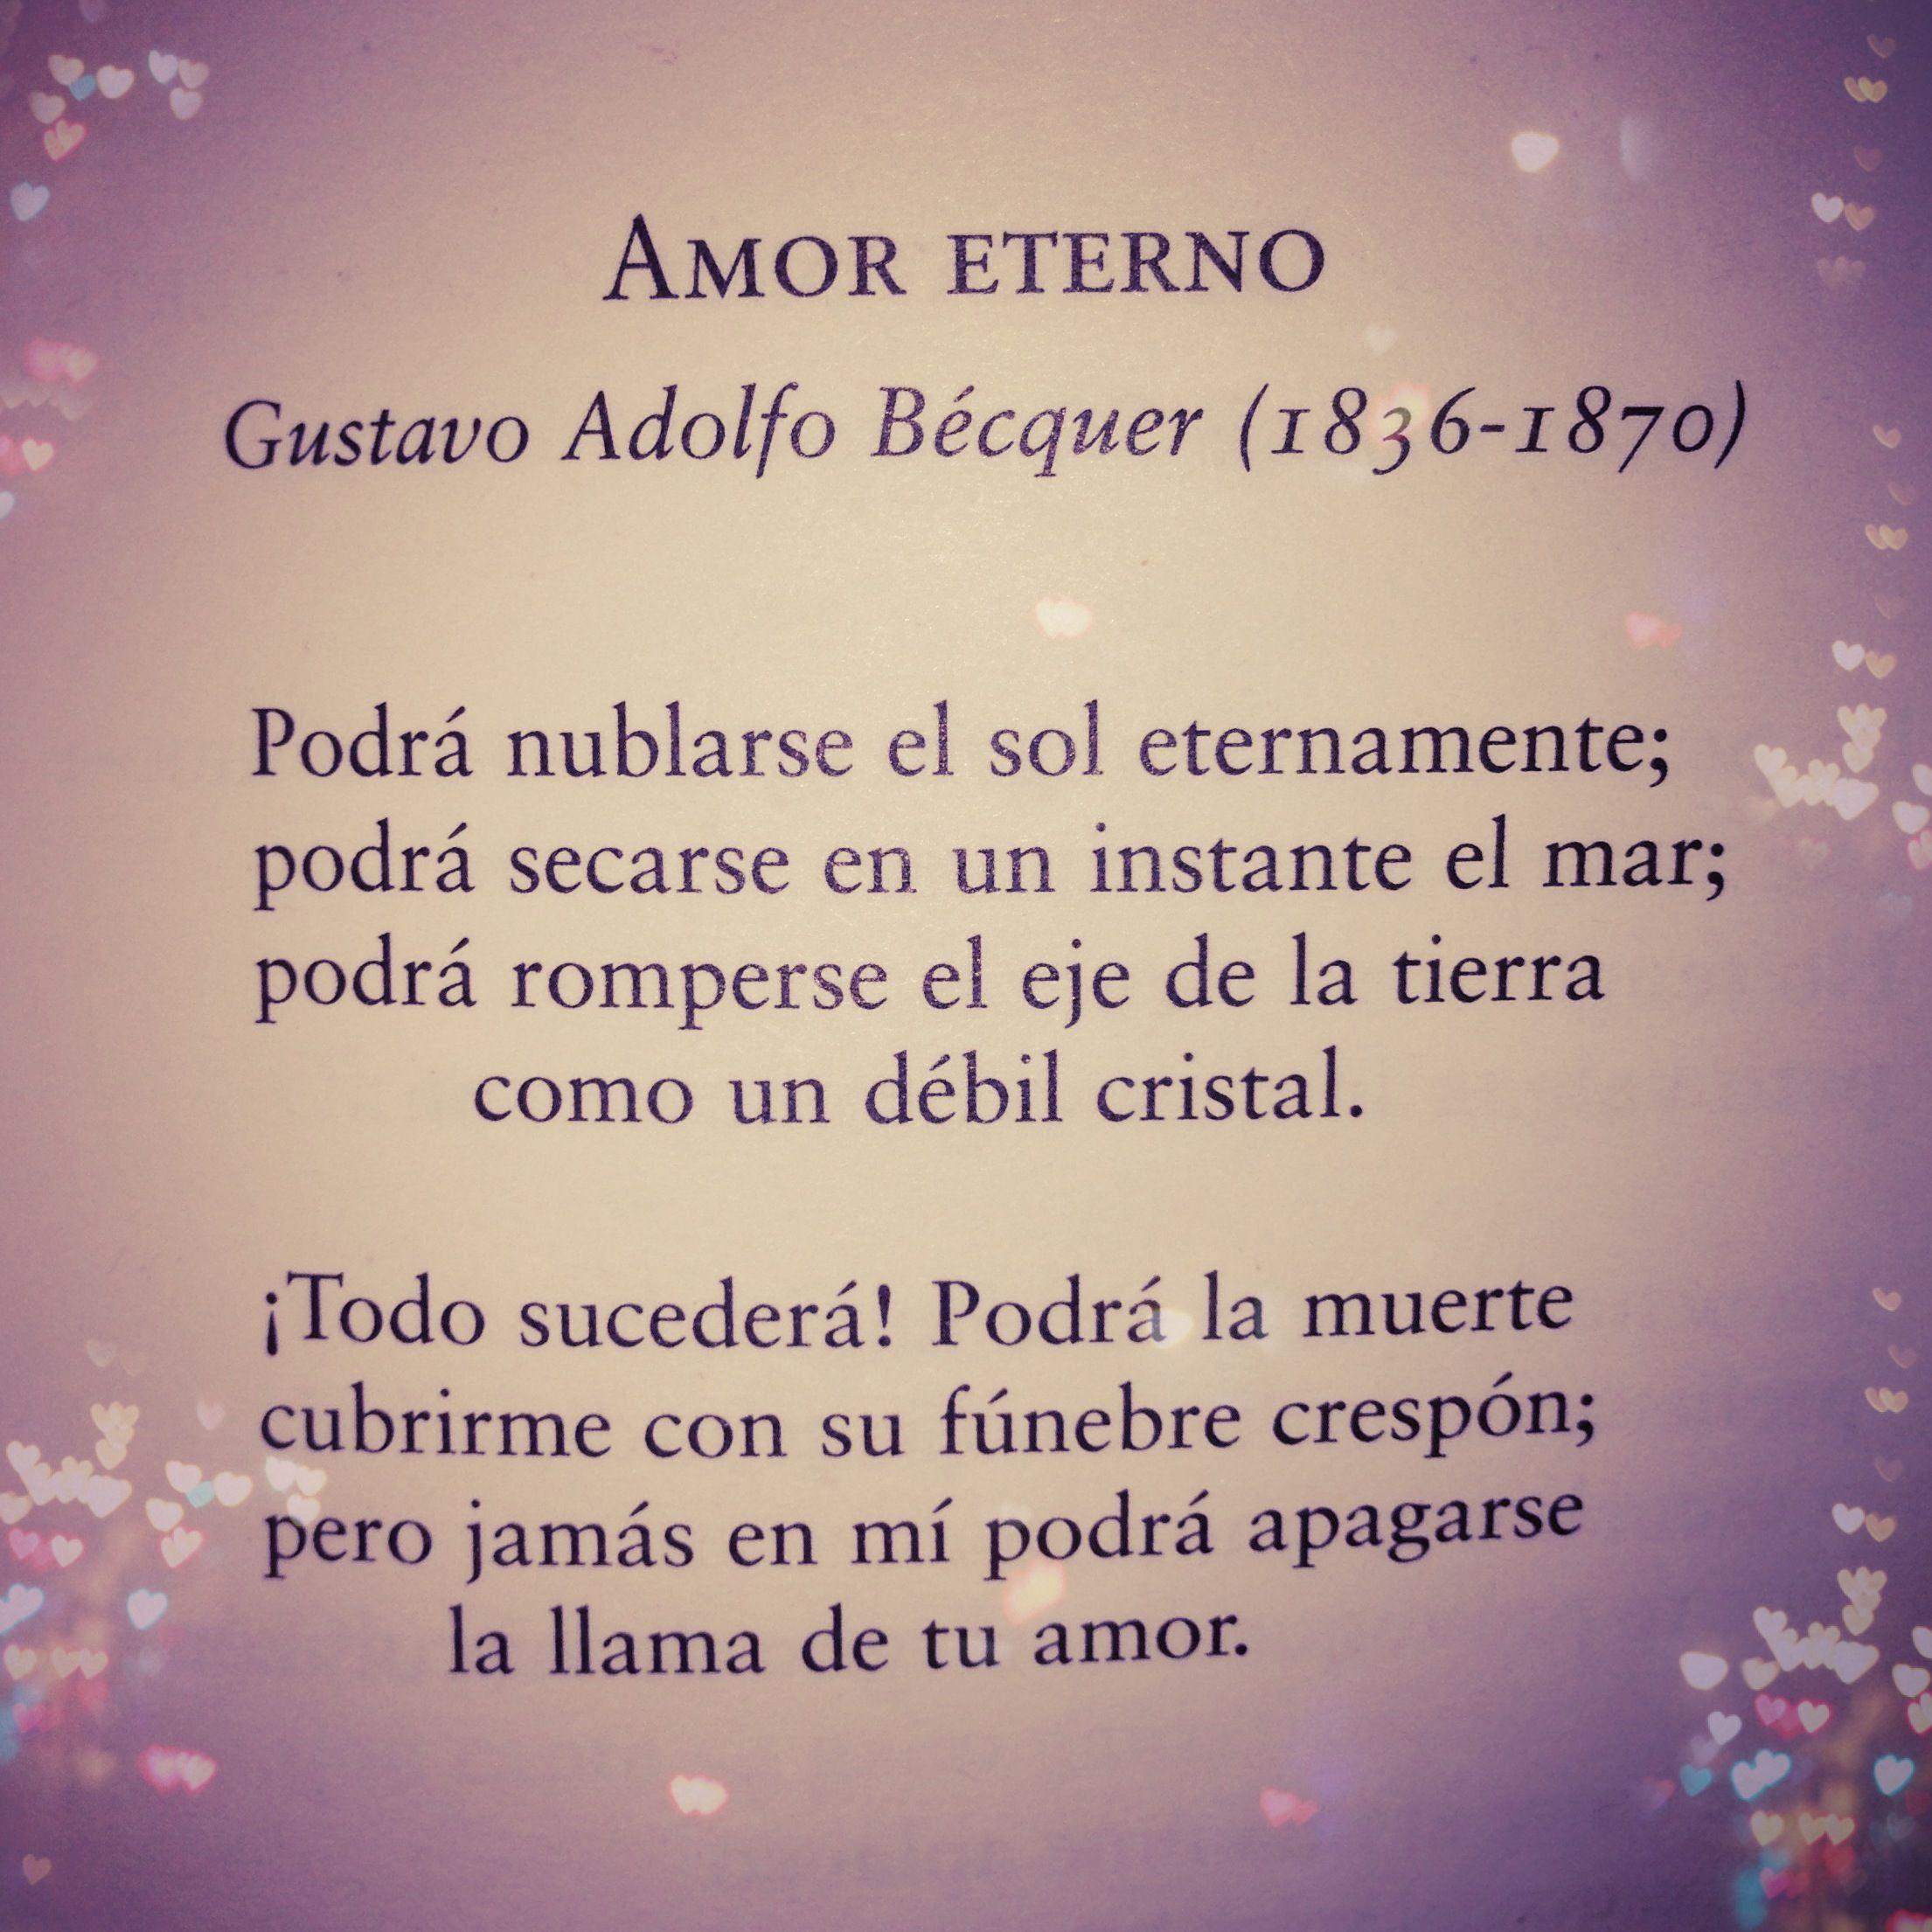 Gustavo Adolfo Bécquer Amor Eterno